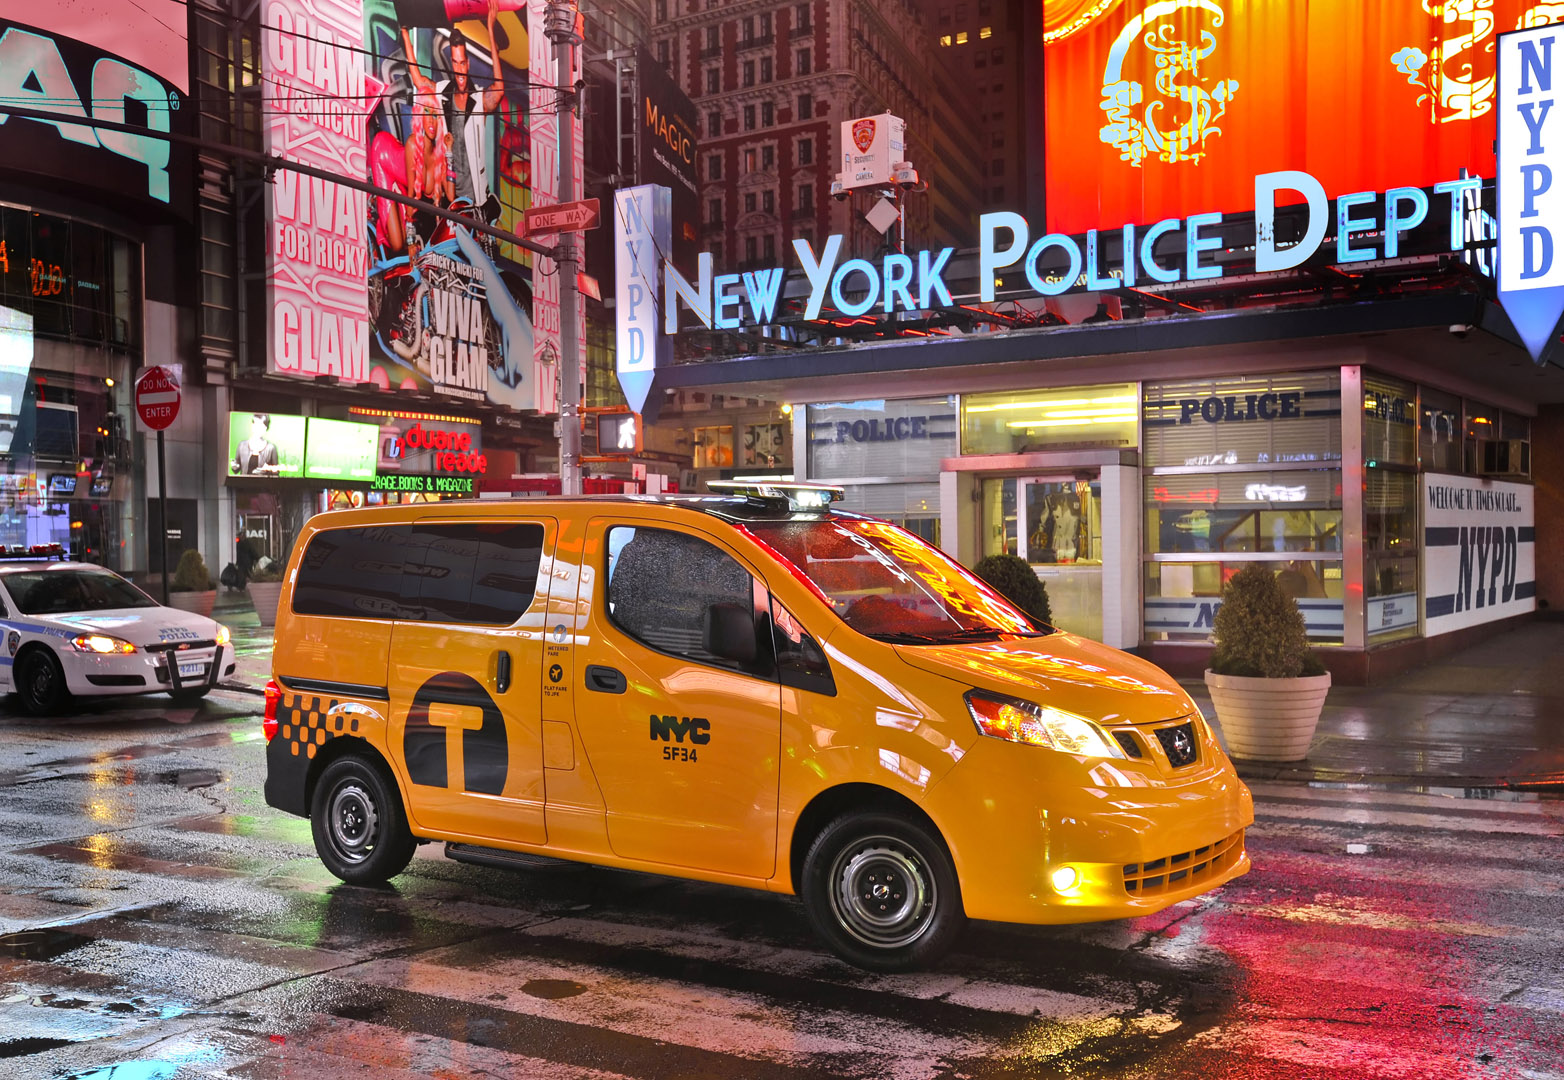 http://2.bp.blogspot.com/-4IHPl4T5Jsk/T_99e52D2wI/AAAAAAAAE2Q/I0EnsHTSKQg/s1600/Nissan+NV200+New+York+Taxi+Hd+Wallpapers+2014.2.jpg